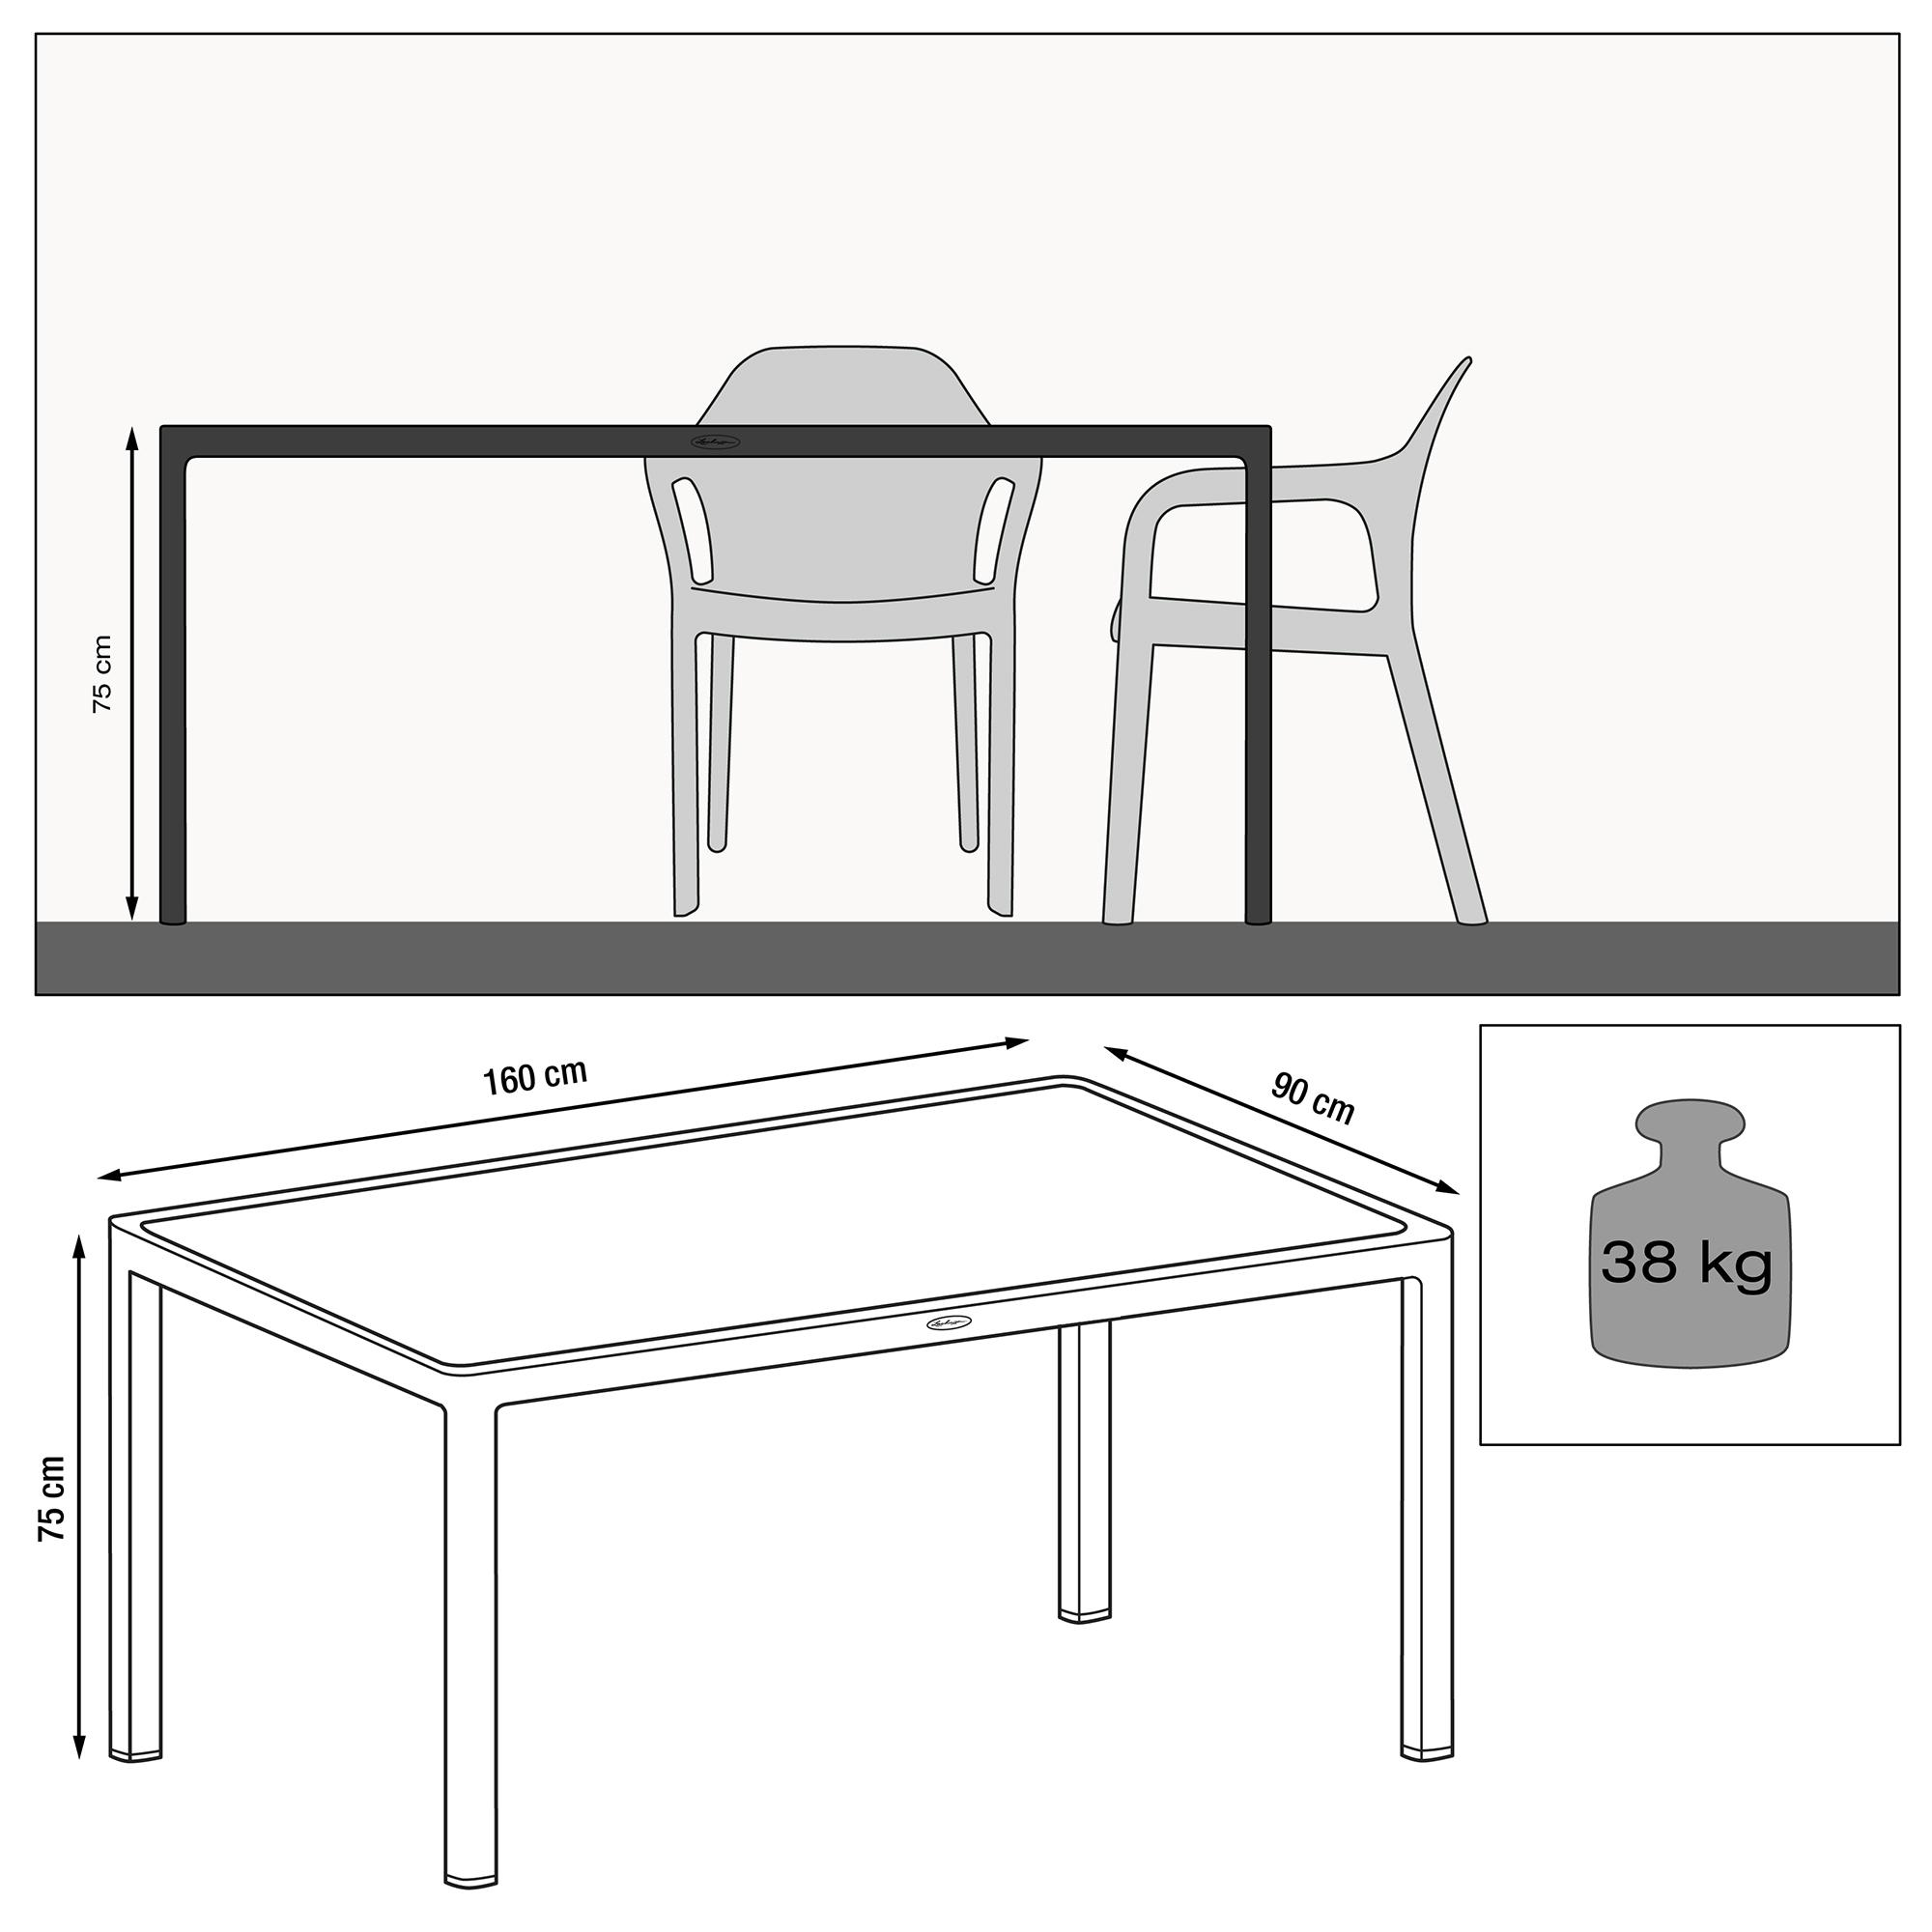 le_esstisch-160_product_addi_nz